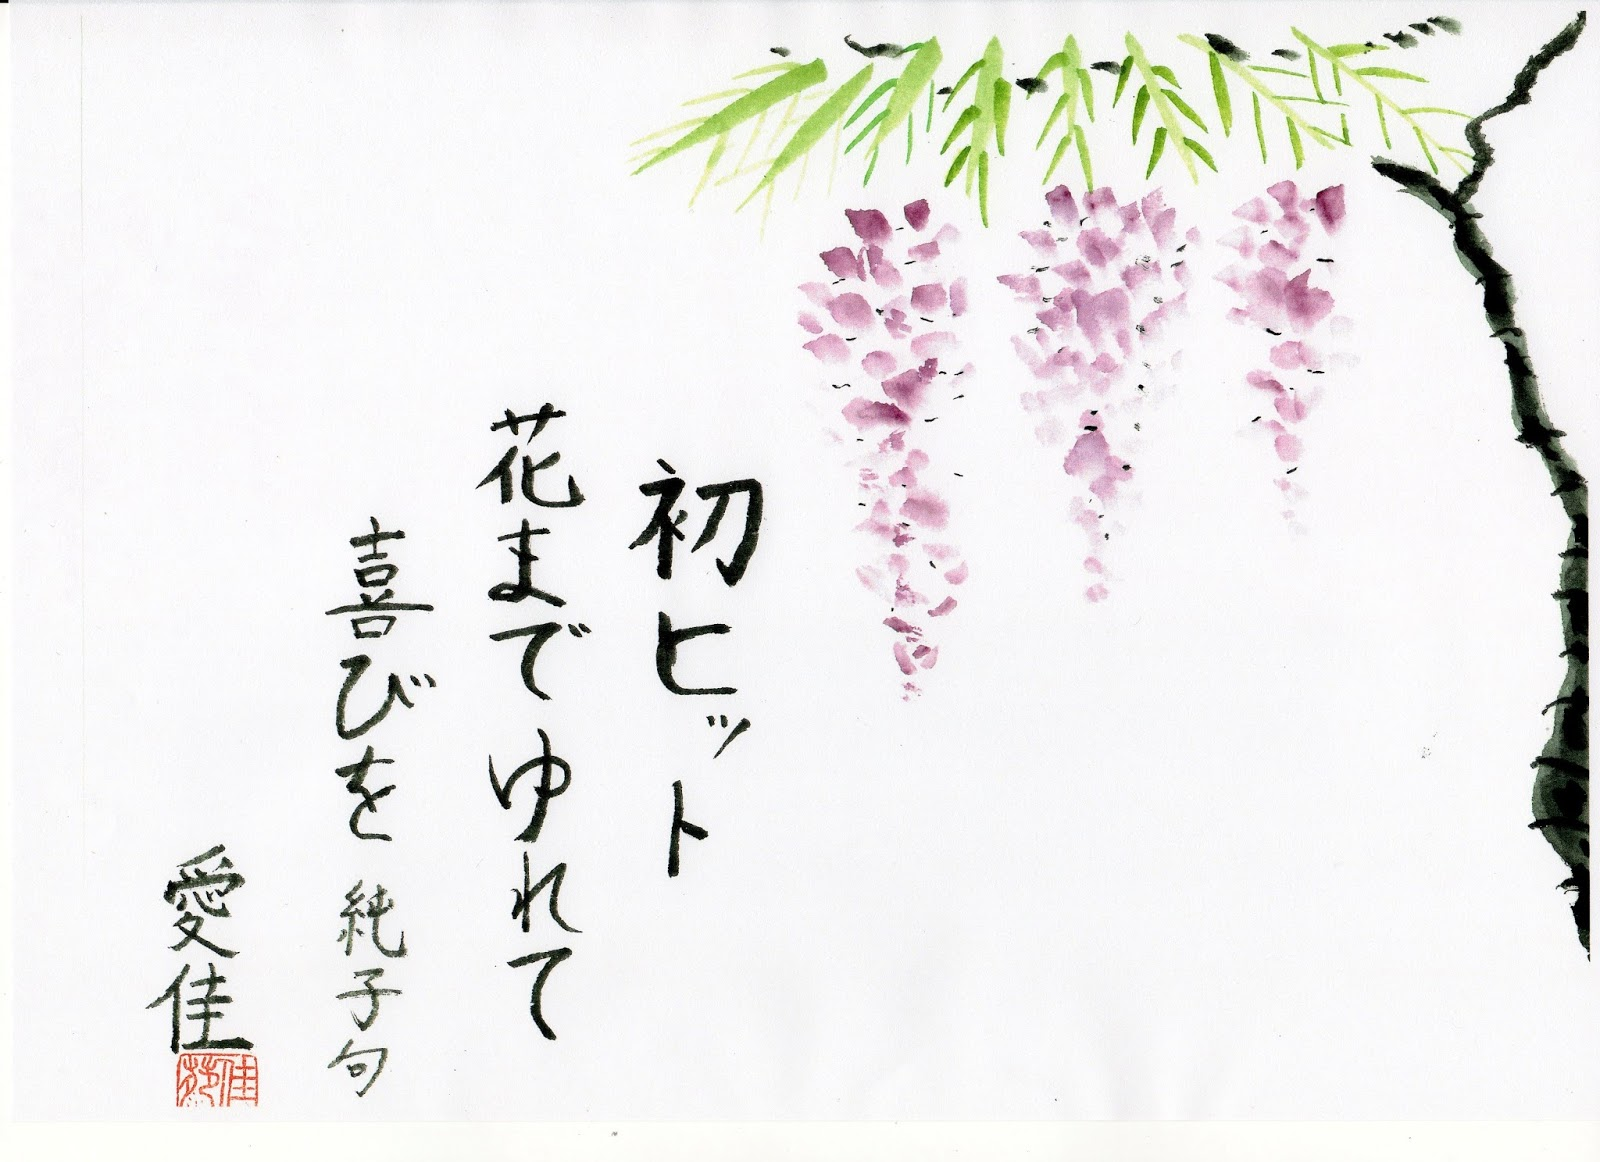 japan haiku зурган илэрцүүд